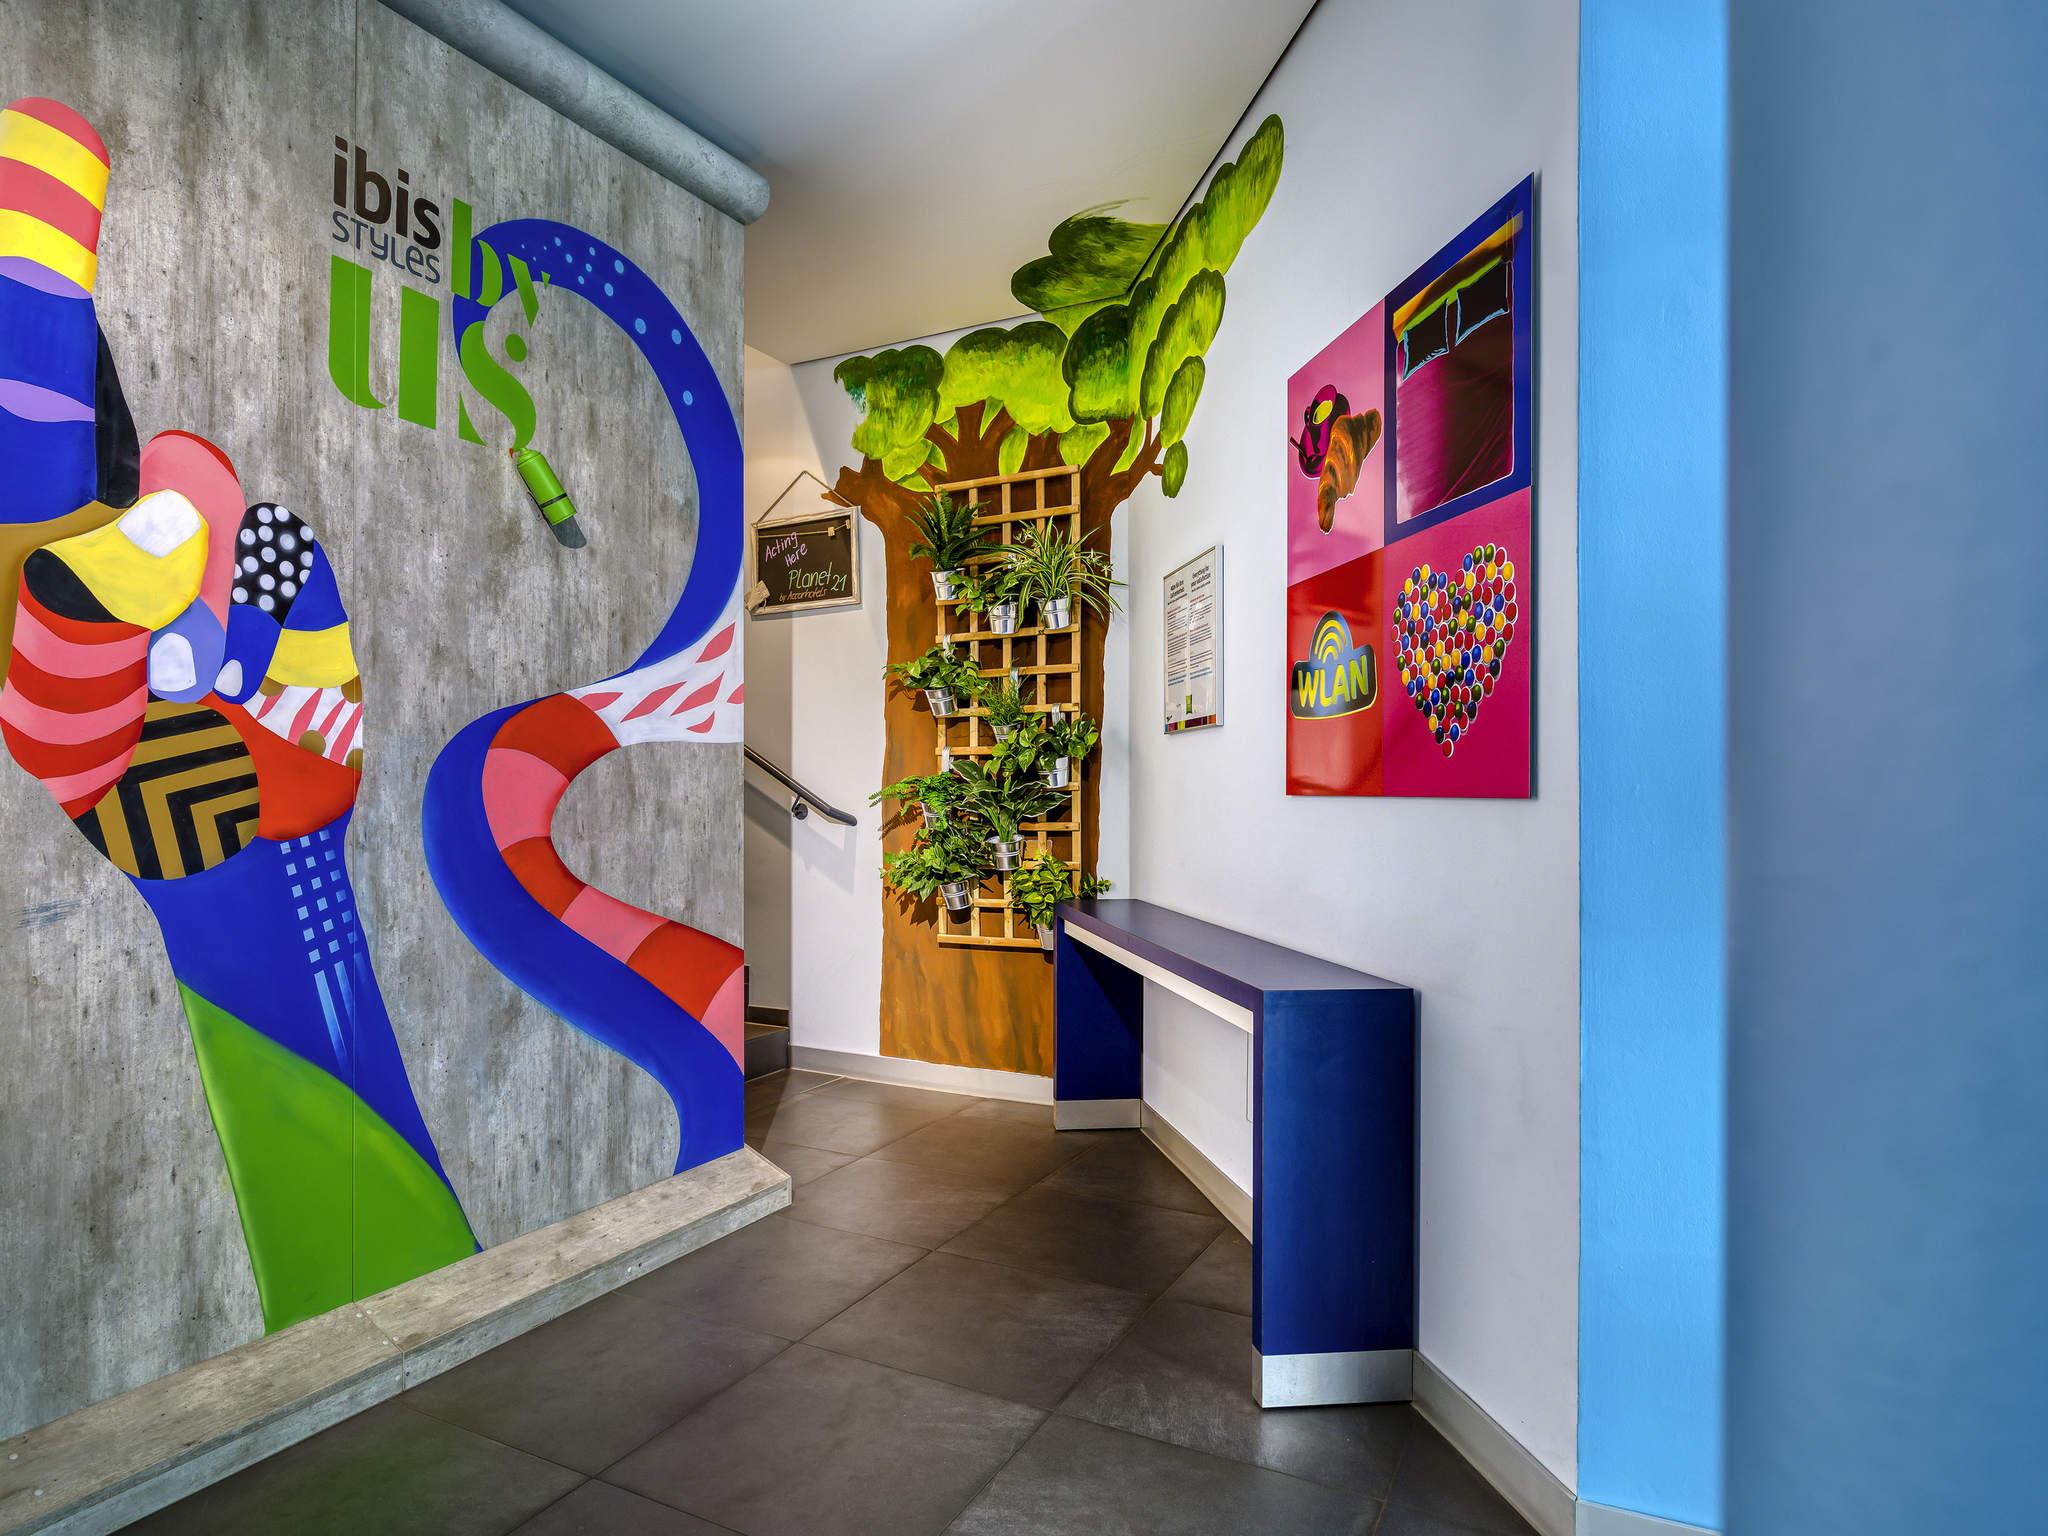 Hotel ibis Styles Berlin Mitte. Book online now! Free Wifi!